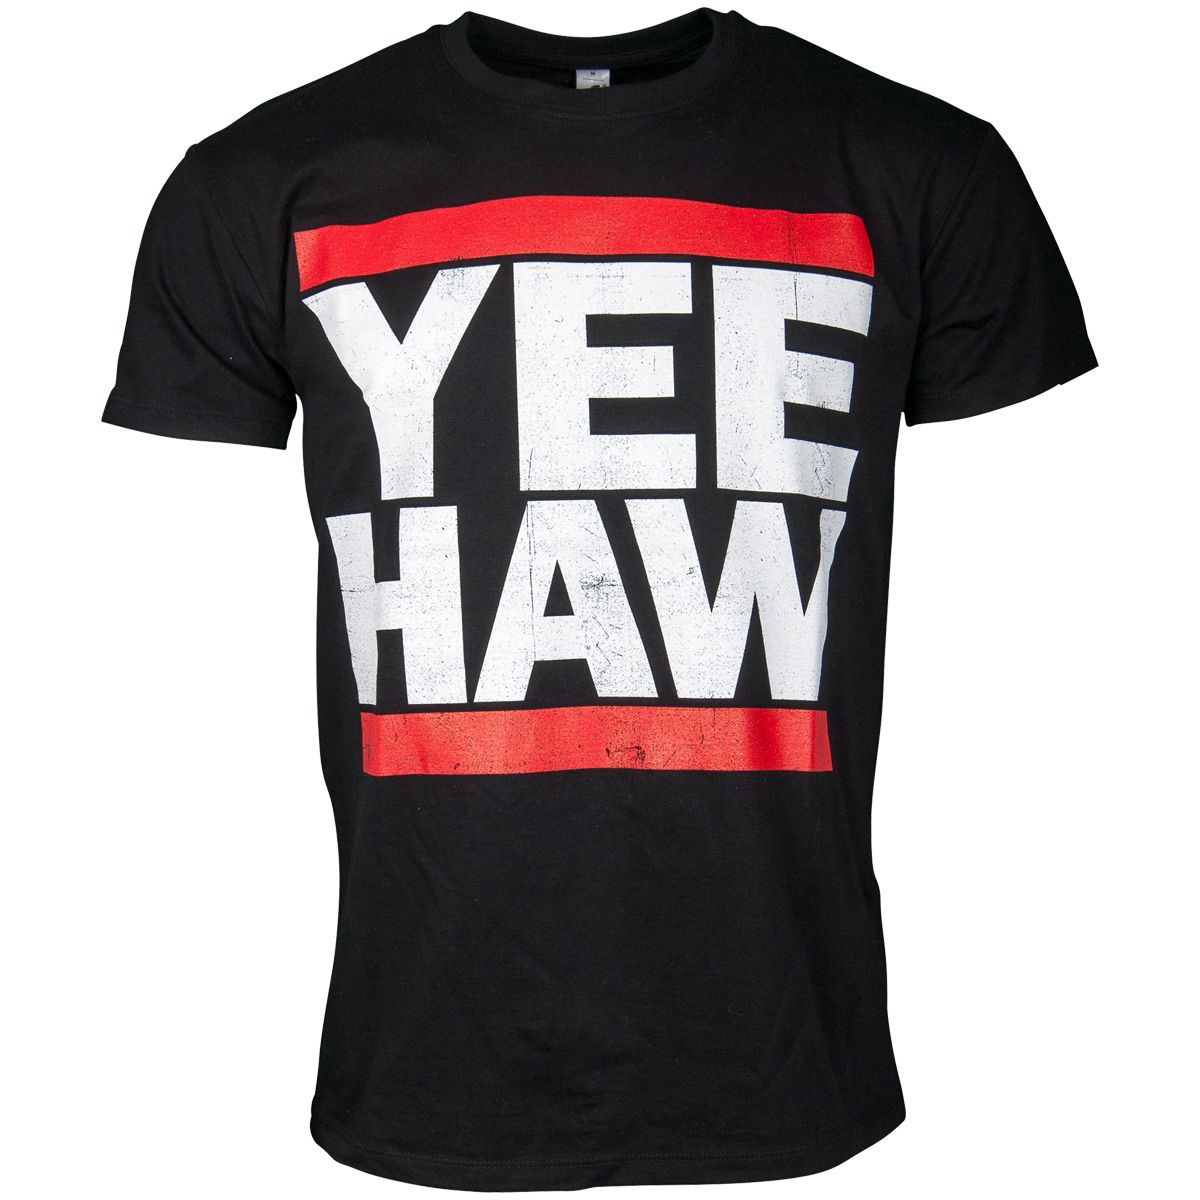 7ce7de82342dd4 The Bosshoss - T-Shirt Yee Haw - schwarz | ROCKnSHOP